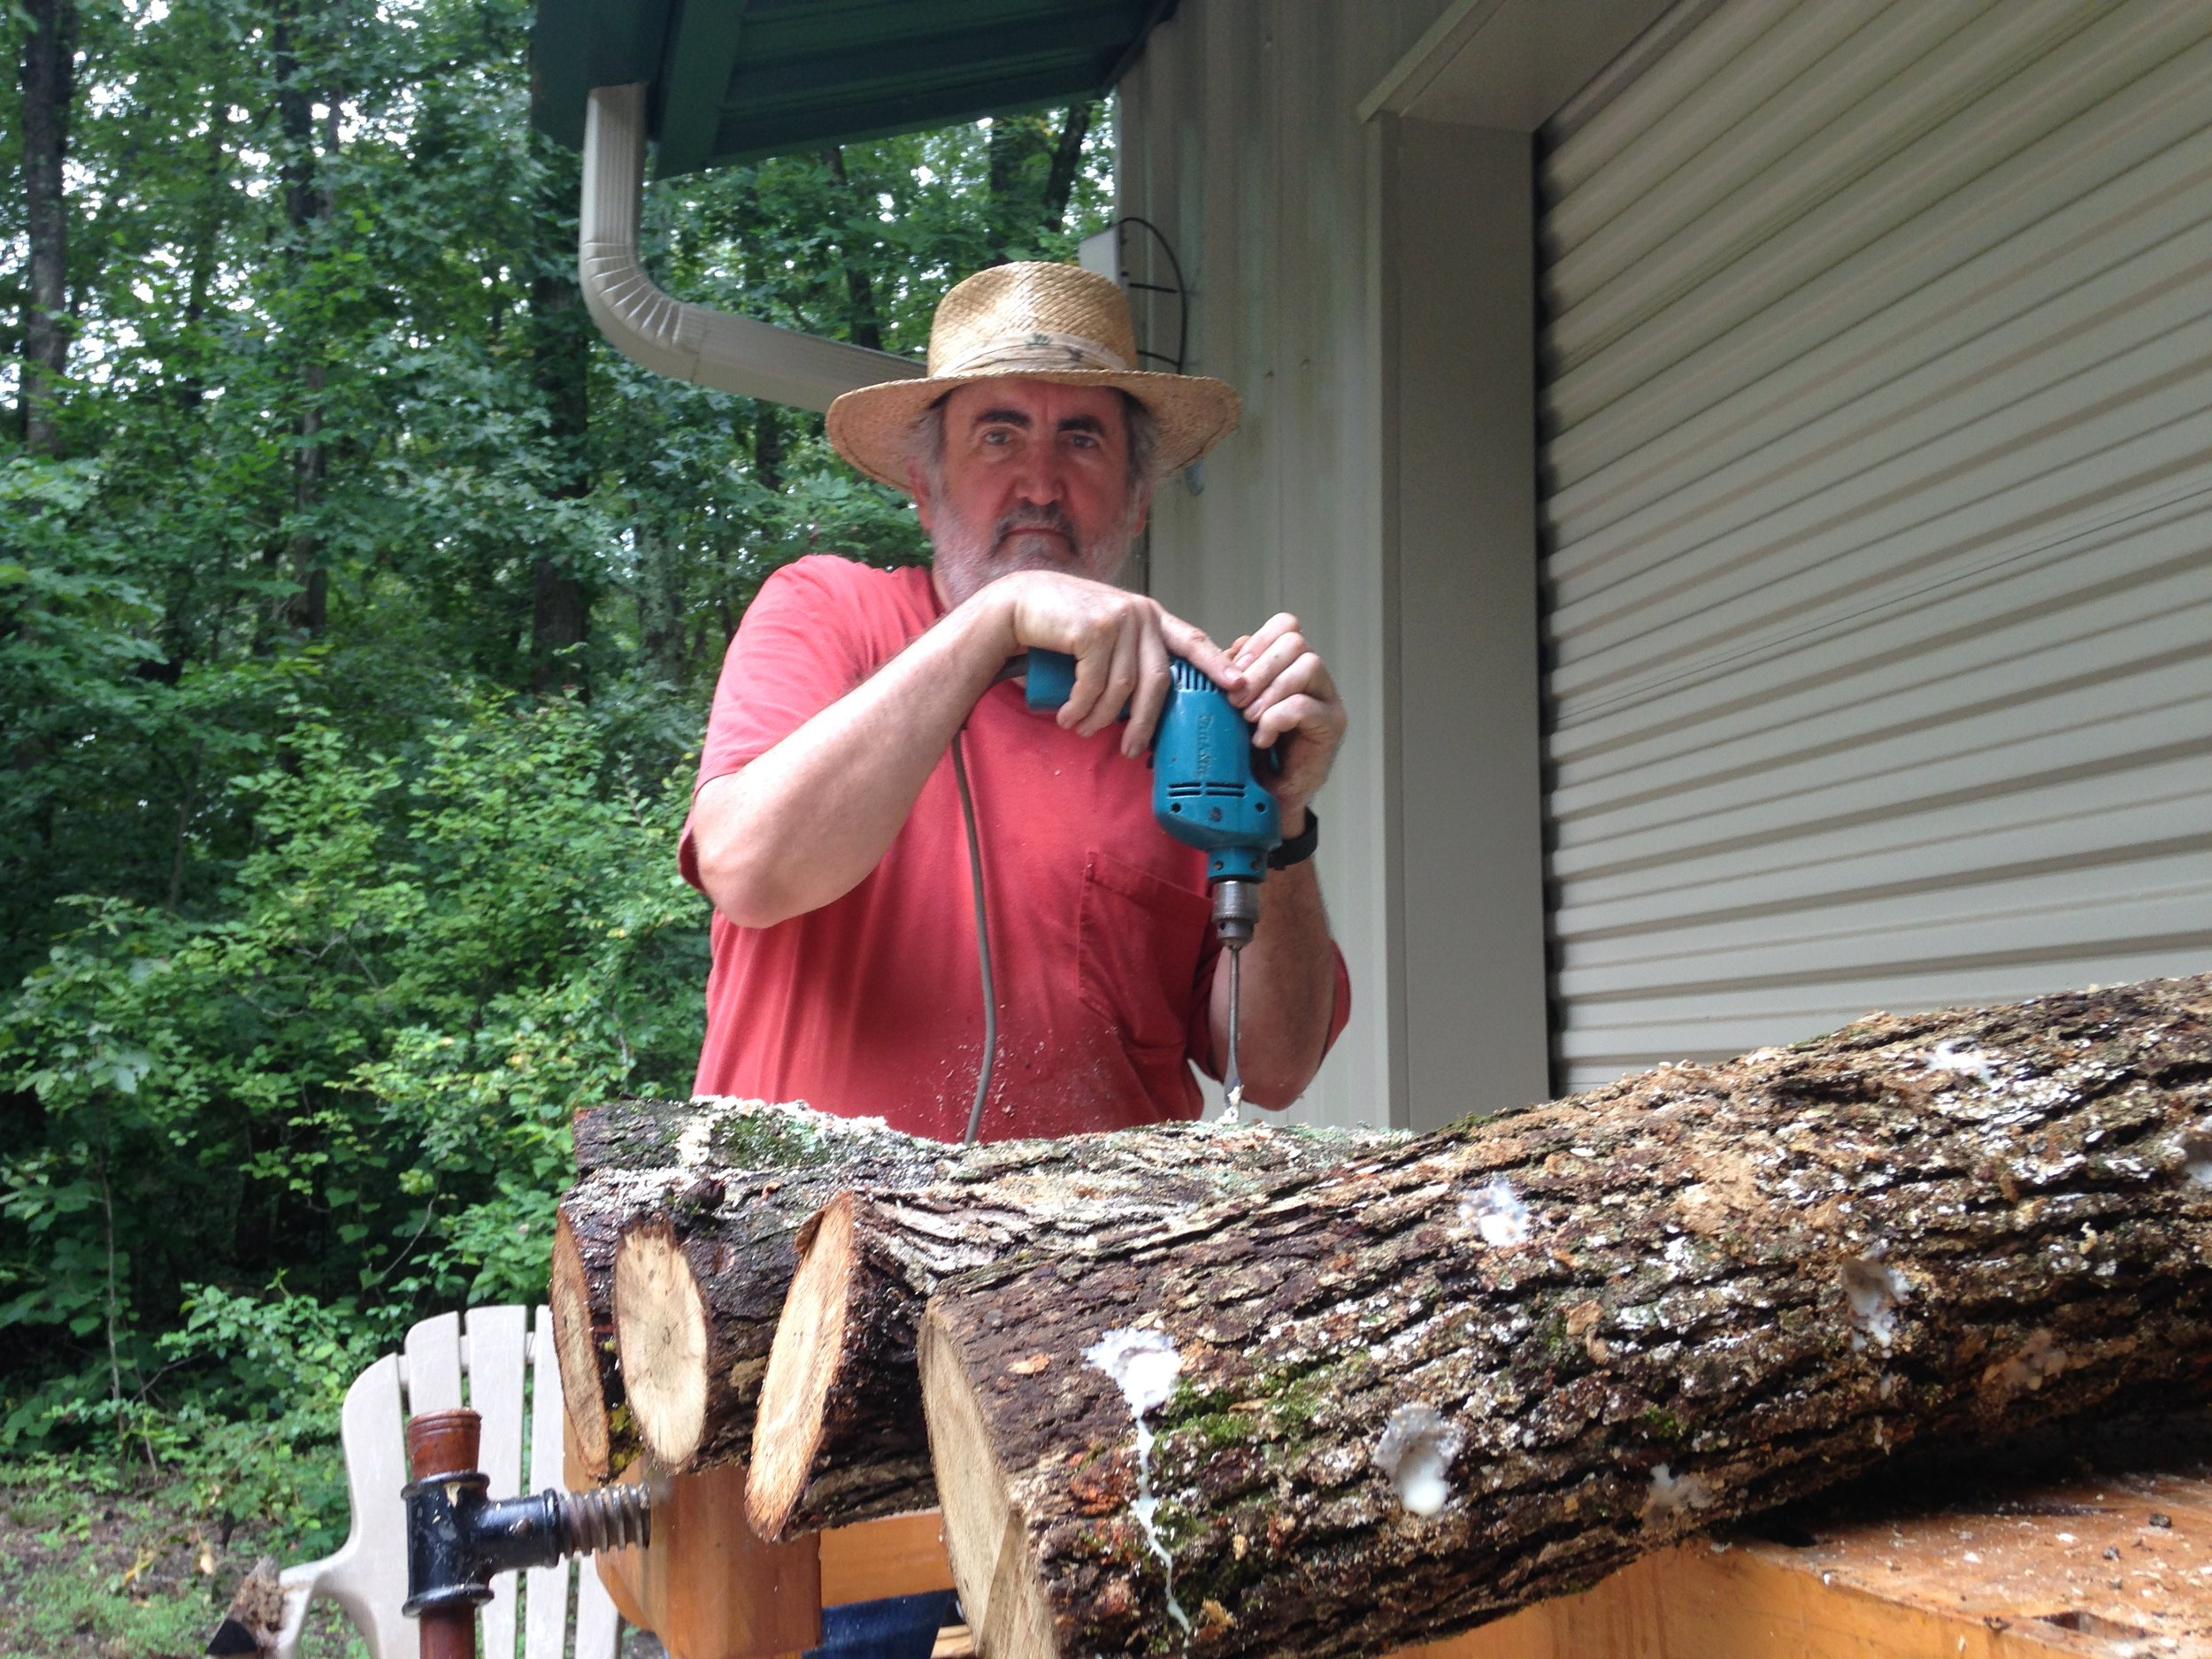 Preparing mushroom logs